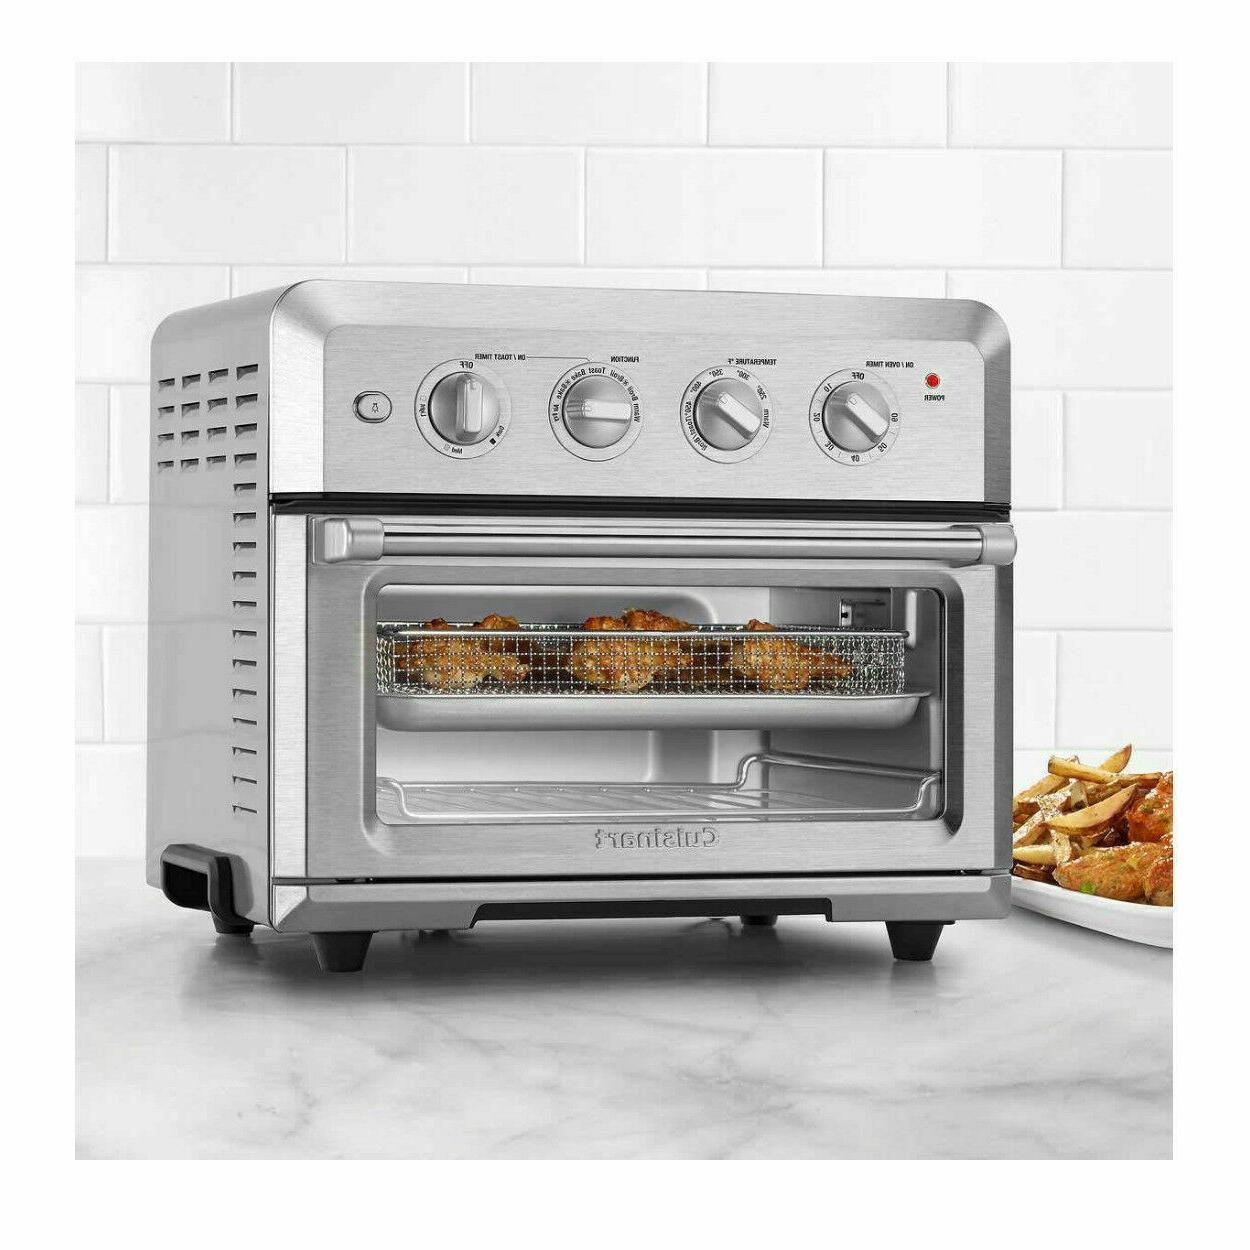 Cuisinart CTOA-120 Oven Air Fryer,